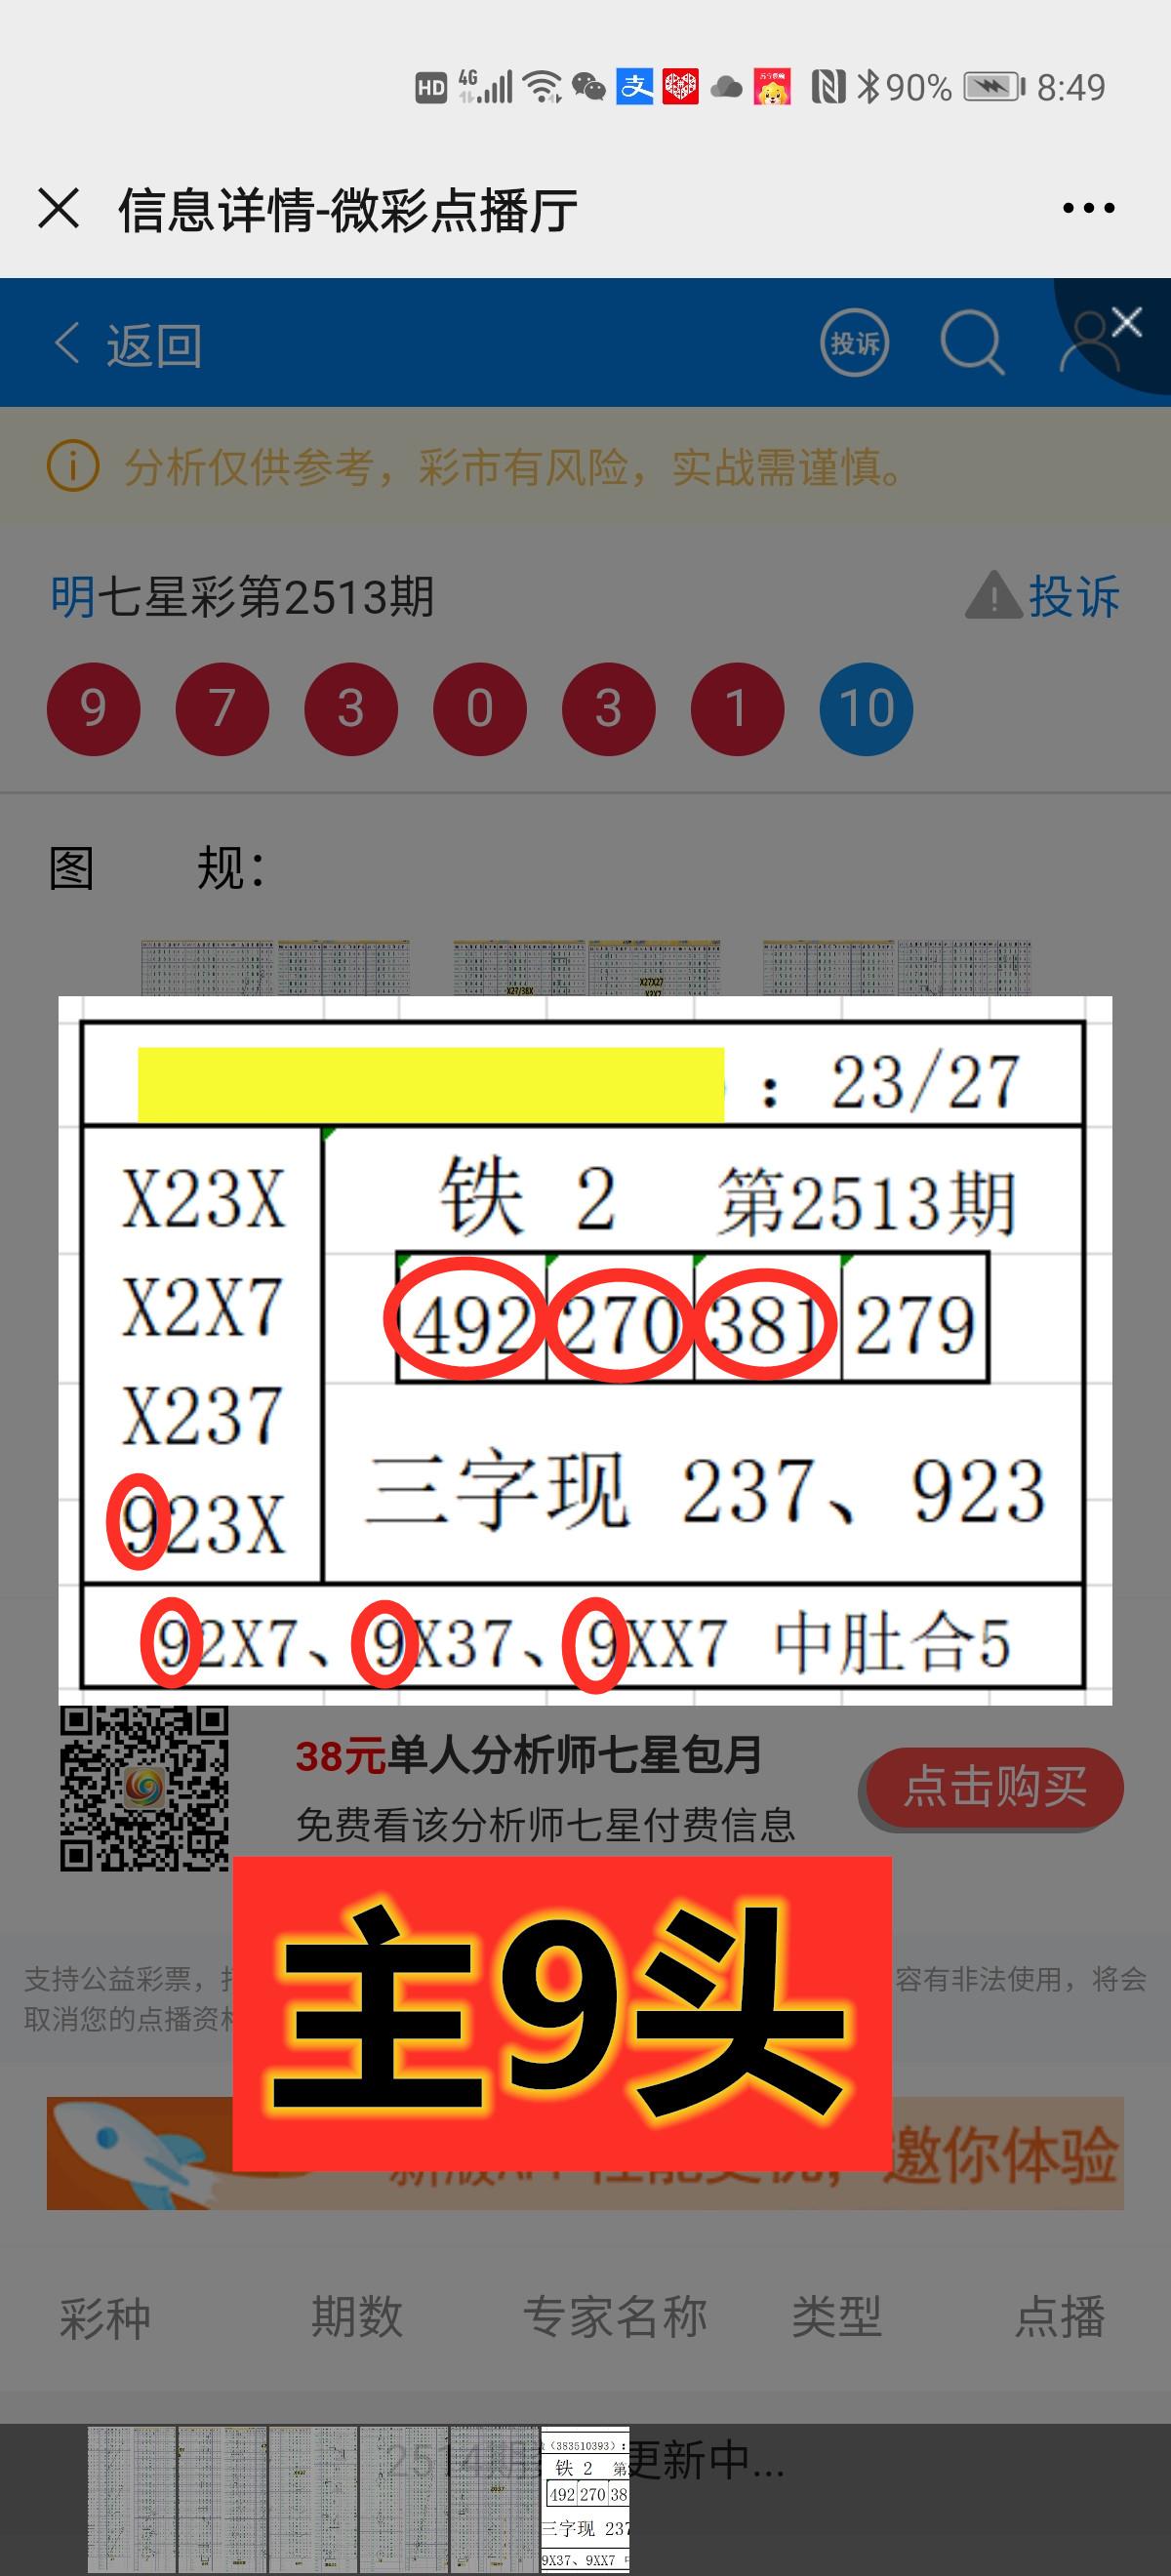 Screenshot_20201120_204930_com.tencent.mm_副本.jpg